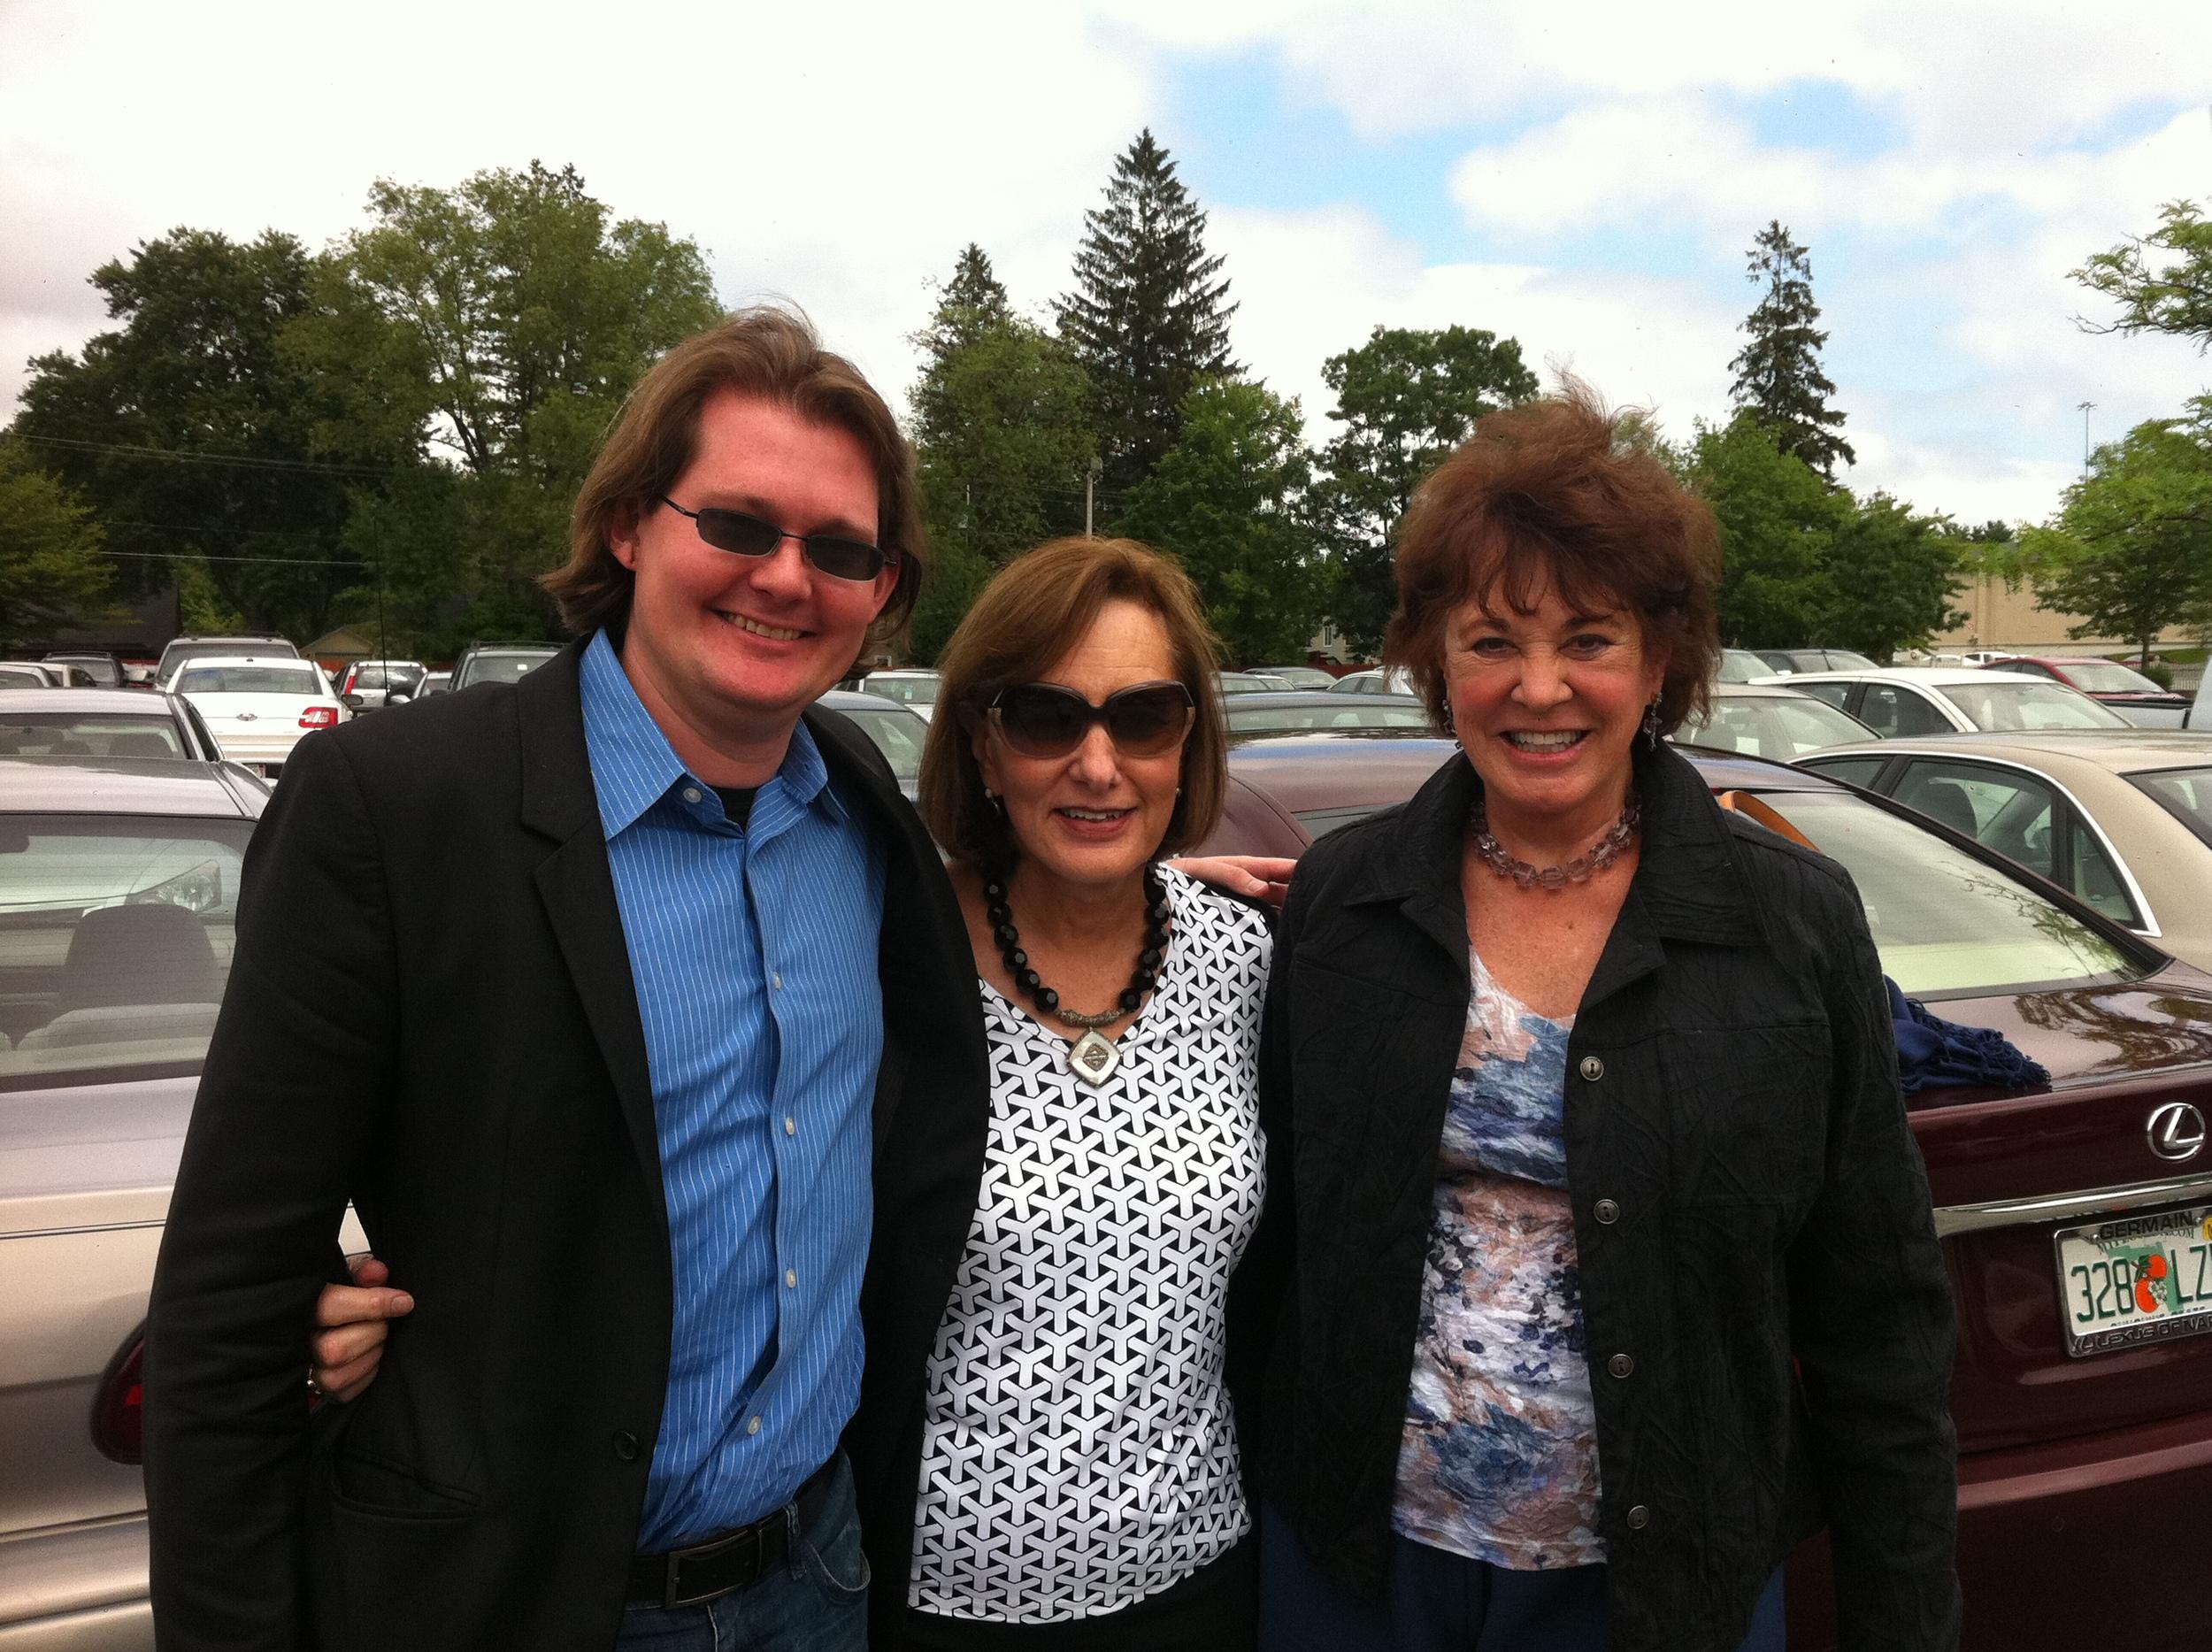 Robert, Joan, Marty in Sturbridge - June 2011